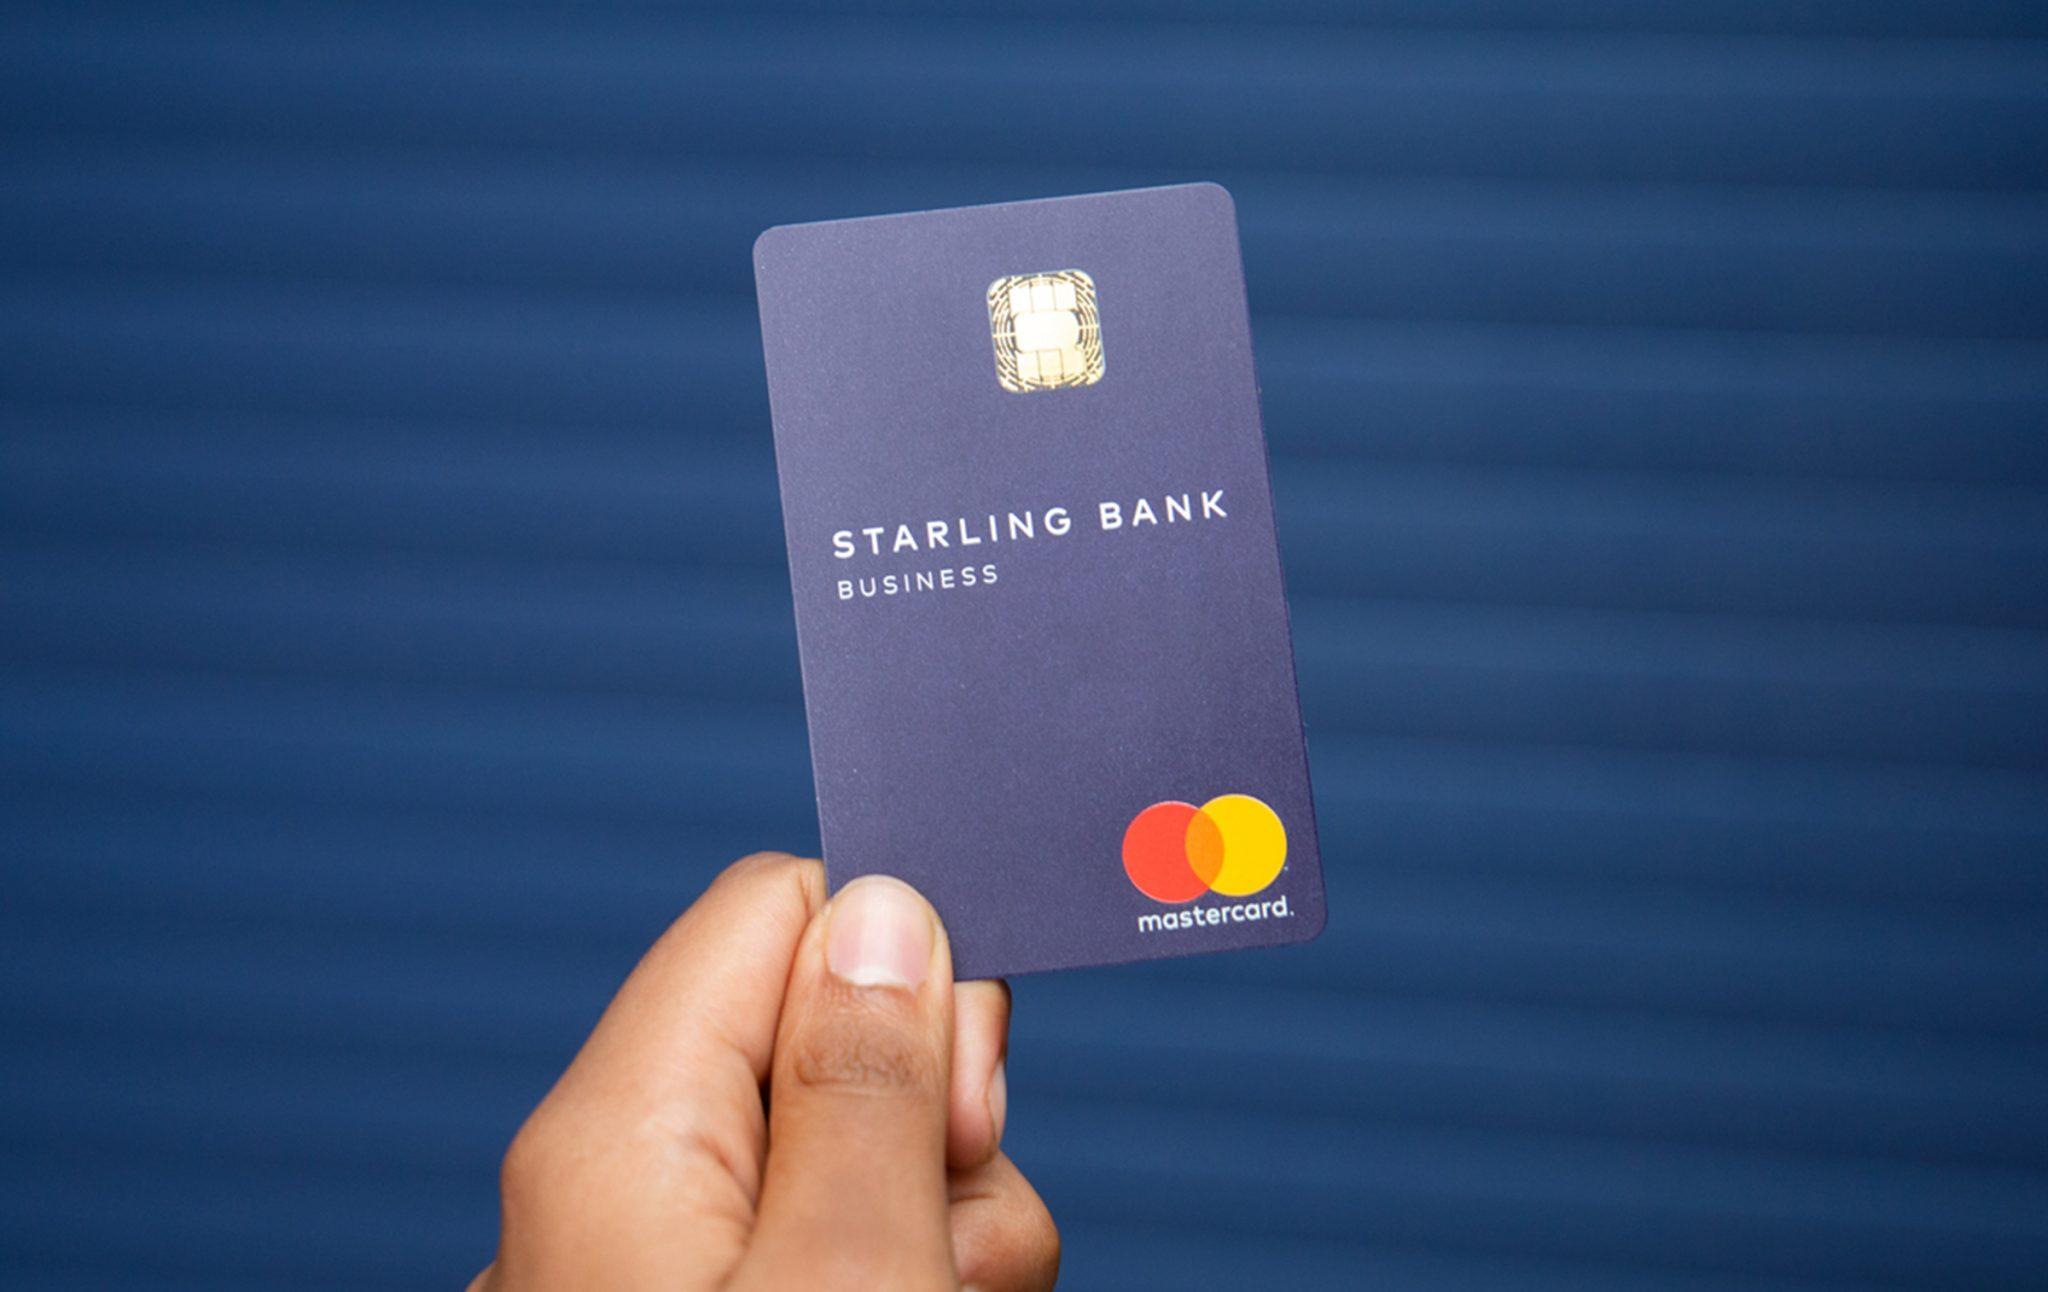 Business StarlingBank A 1